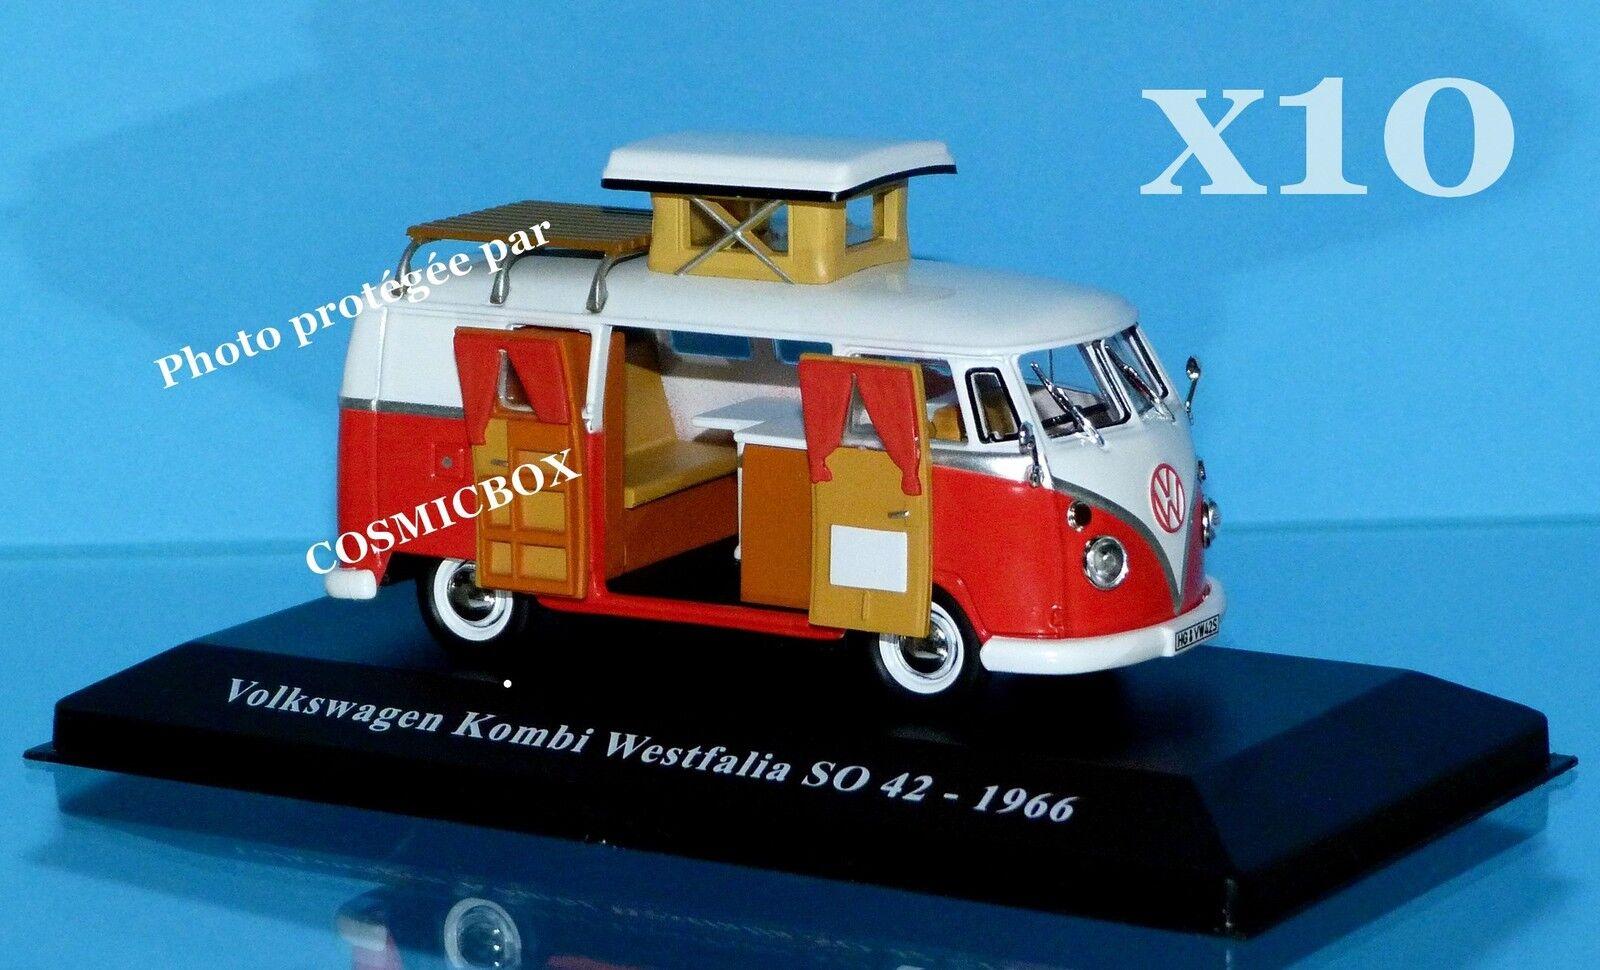 Premio di 10 campeggio-auto VOLKSWAGEN KOMBI WESTFALIA SO 42 1966 kombi camper van